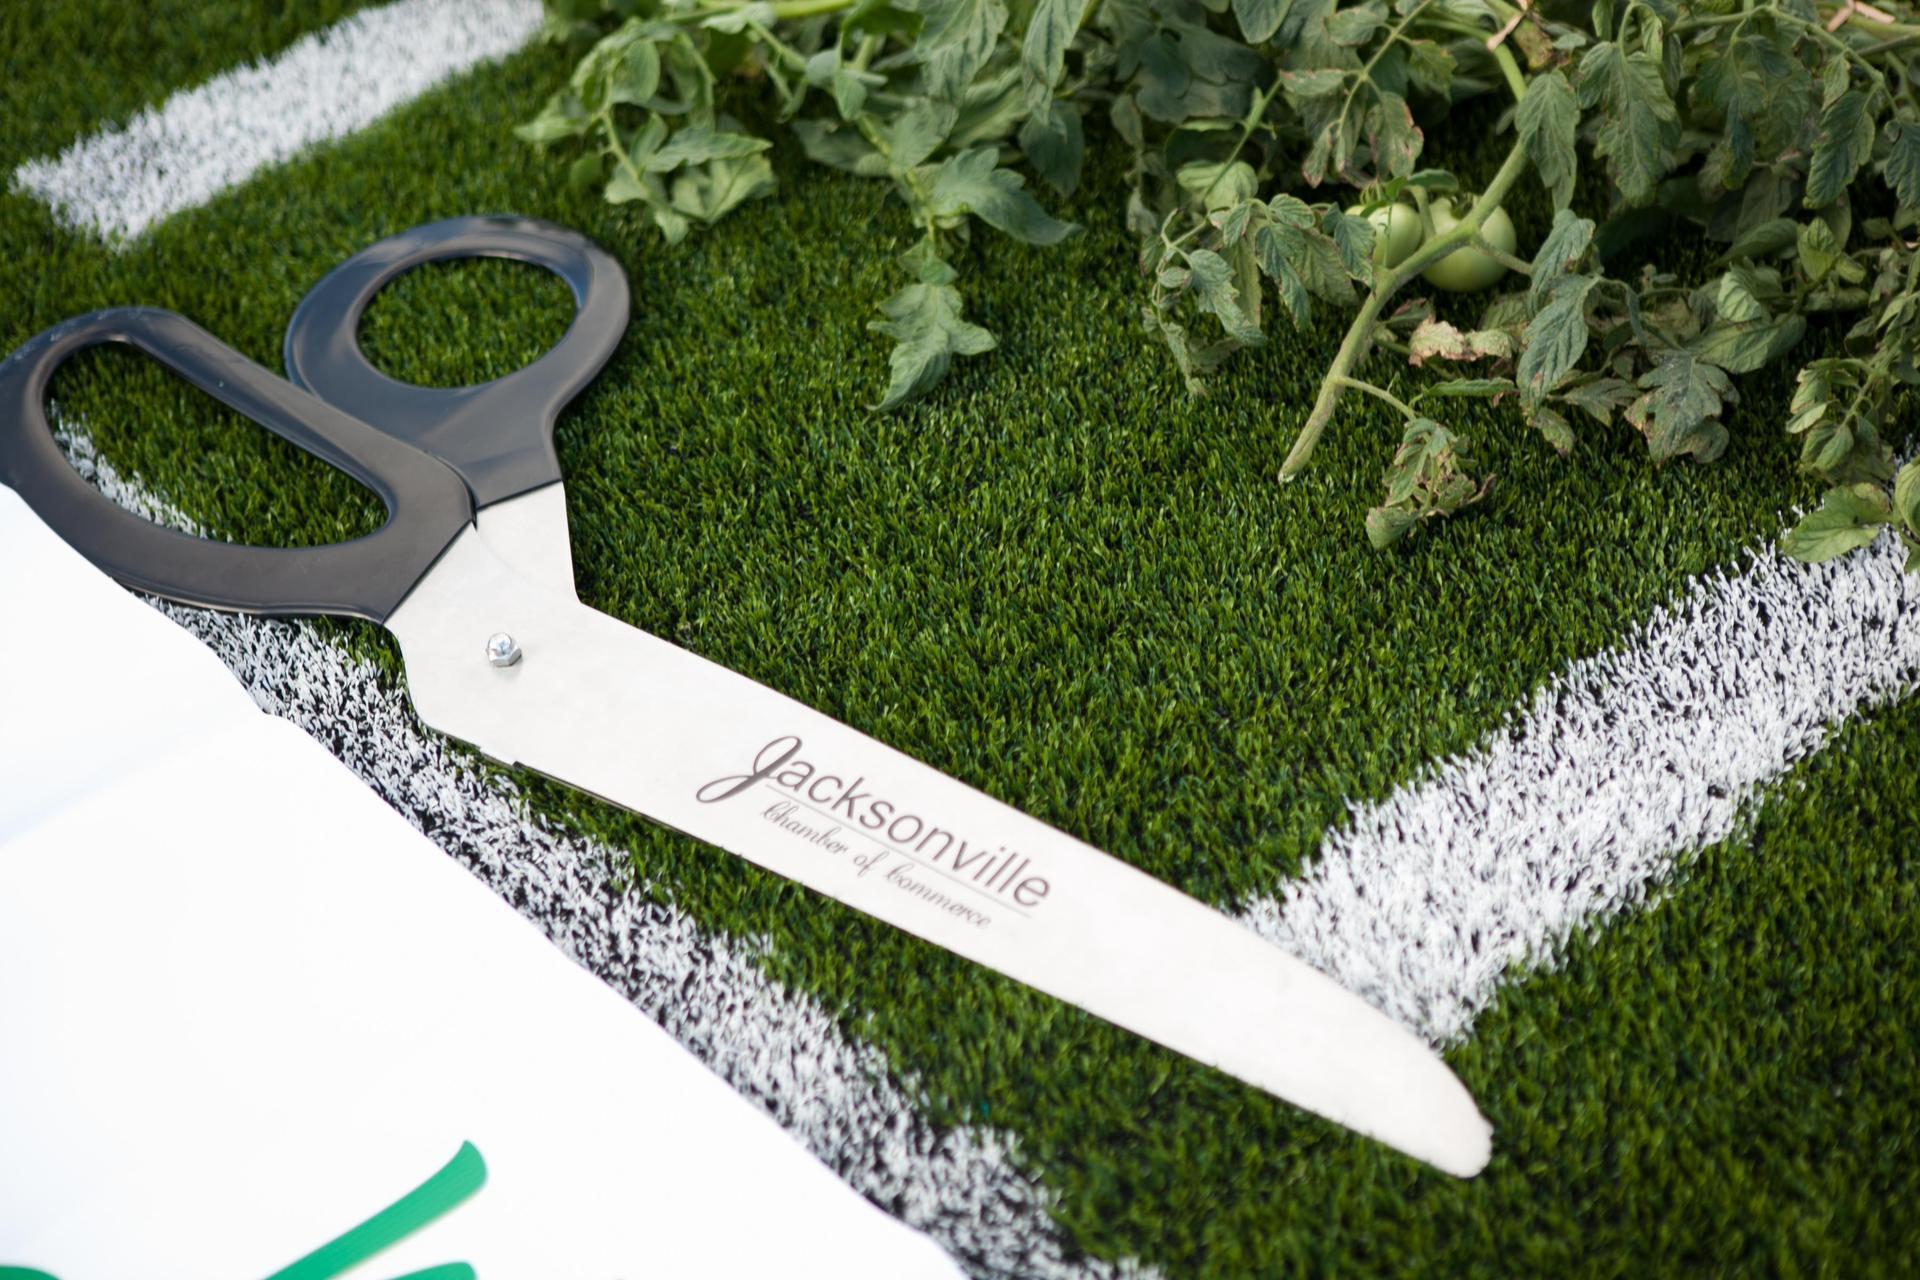 big scissors to cut ribbon (tomato vine) with